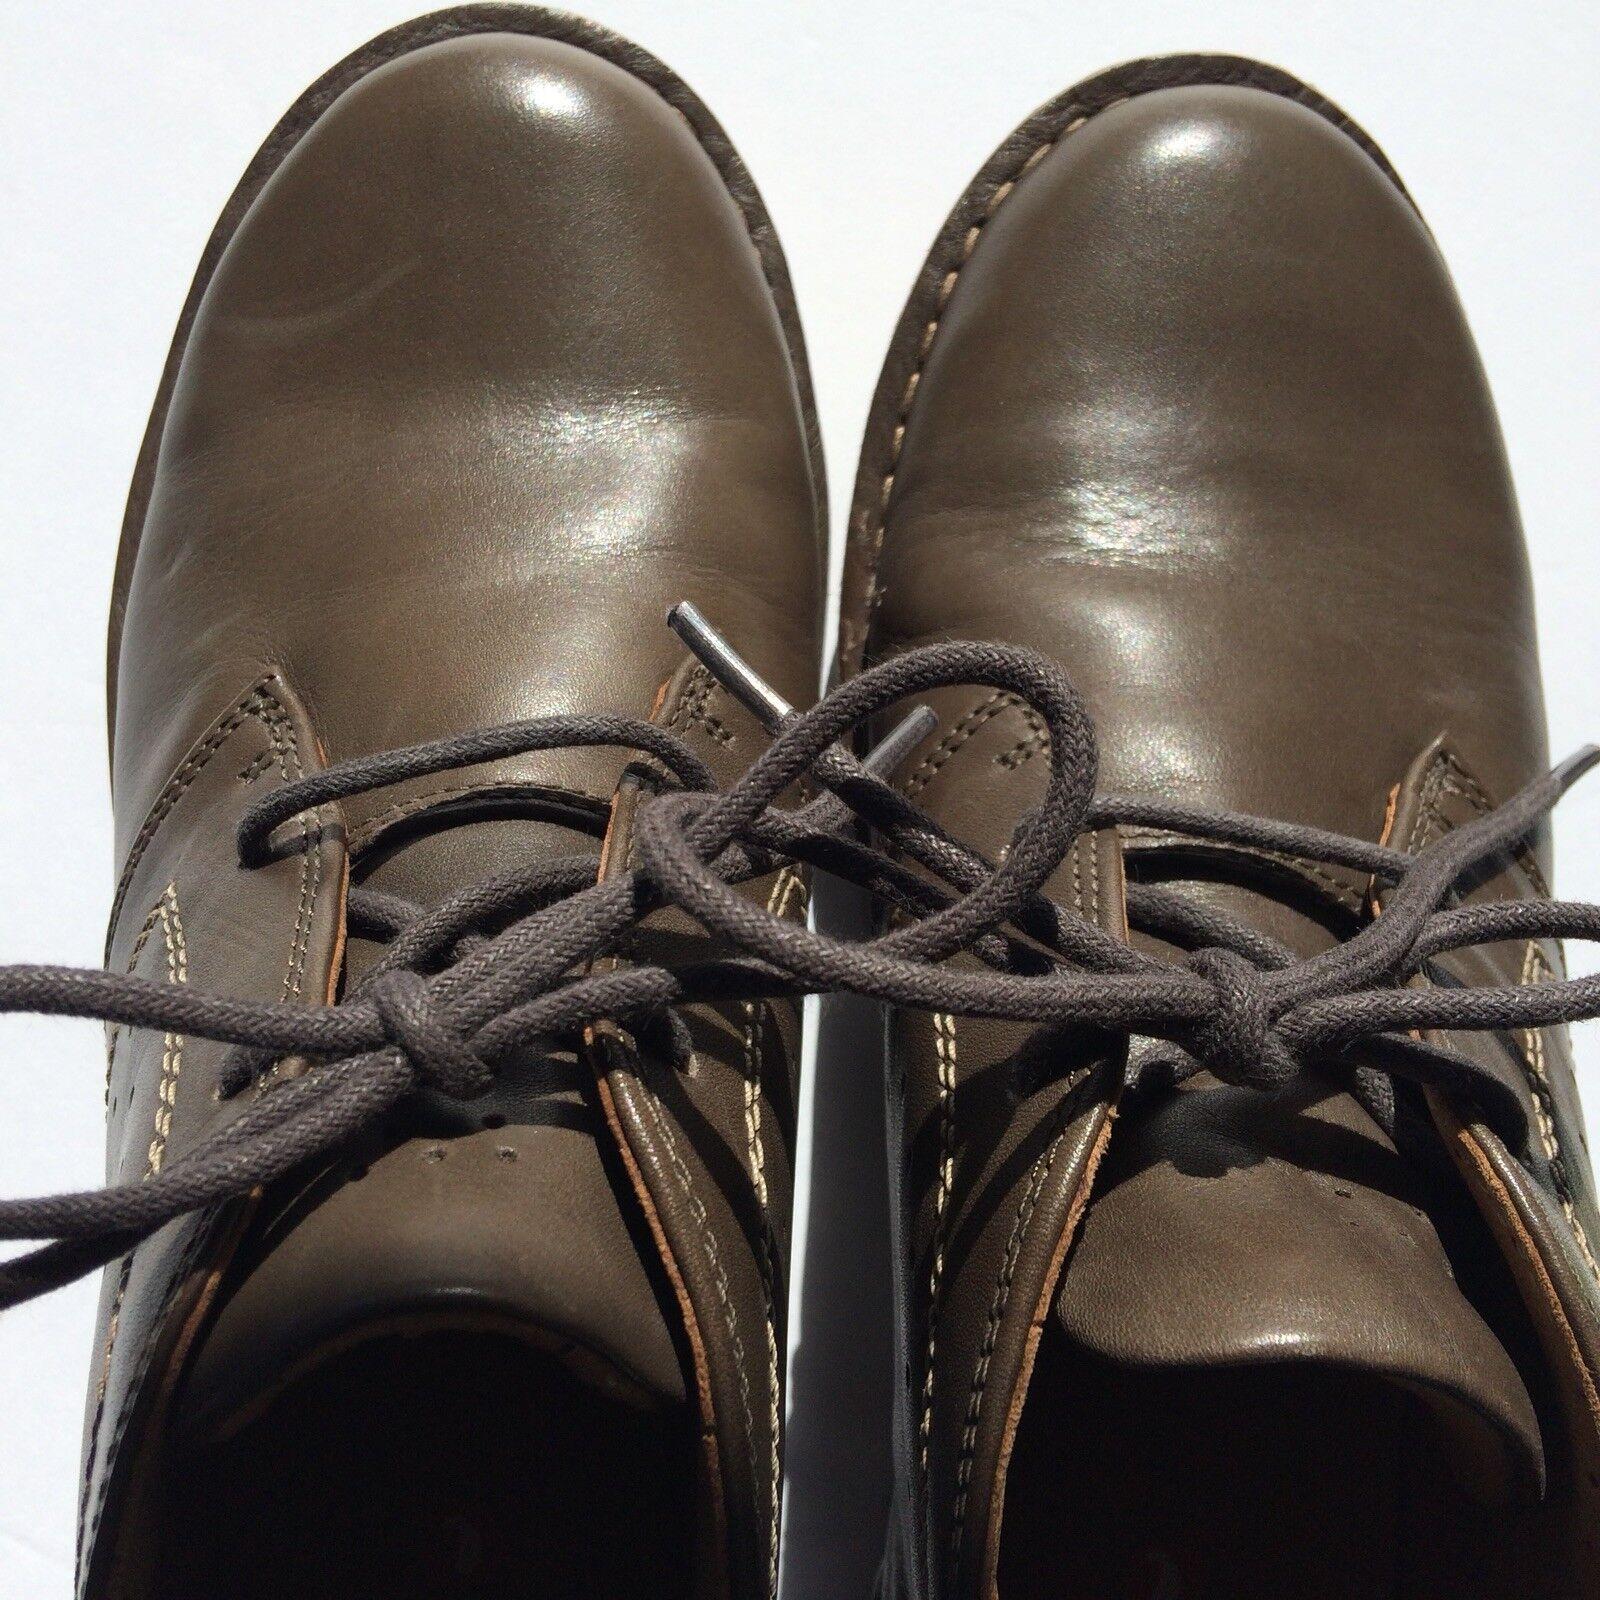 NWOB Clarks Unstructured Un Astin Boot Booties Women's Women's Women's Size 7 Brown cafb09